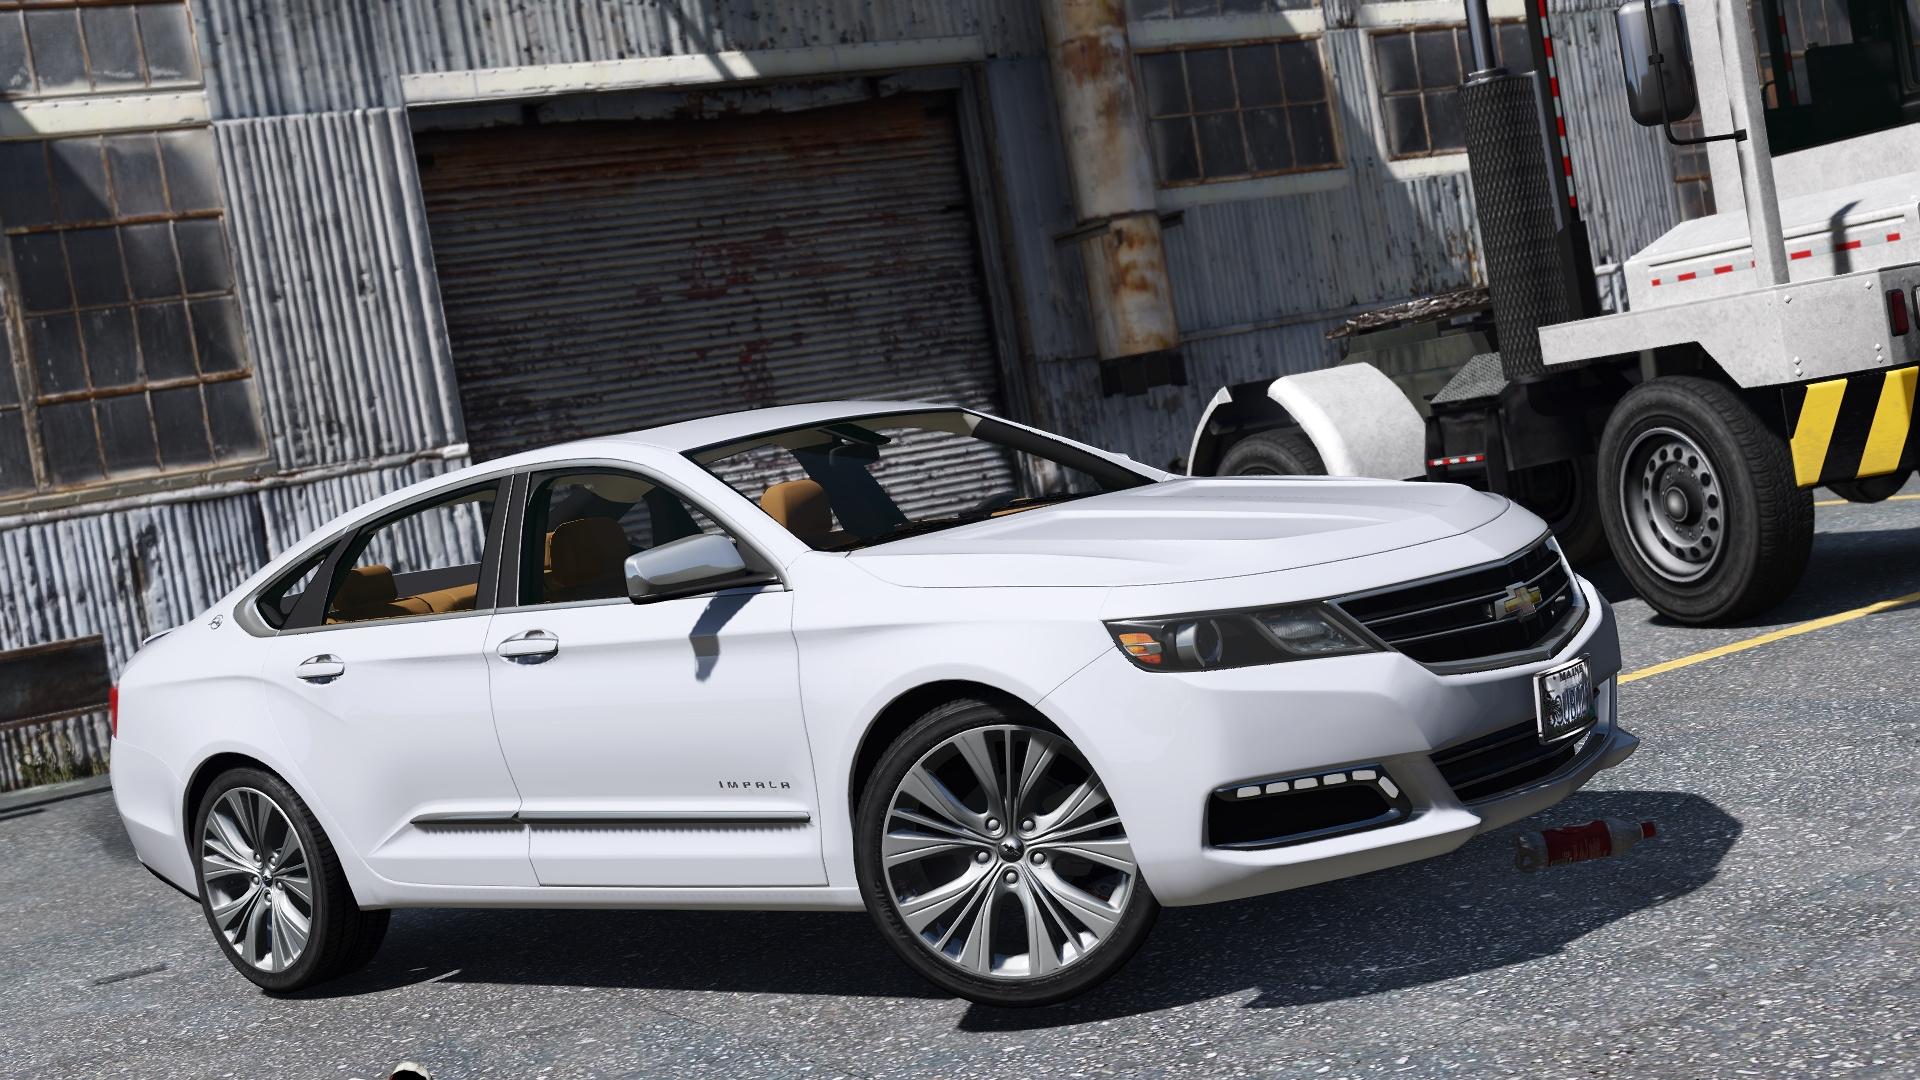 chevrolet impala sale lot copart in salvage certificate ls carfinder auctions silver on ltz auto ca en martinez online